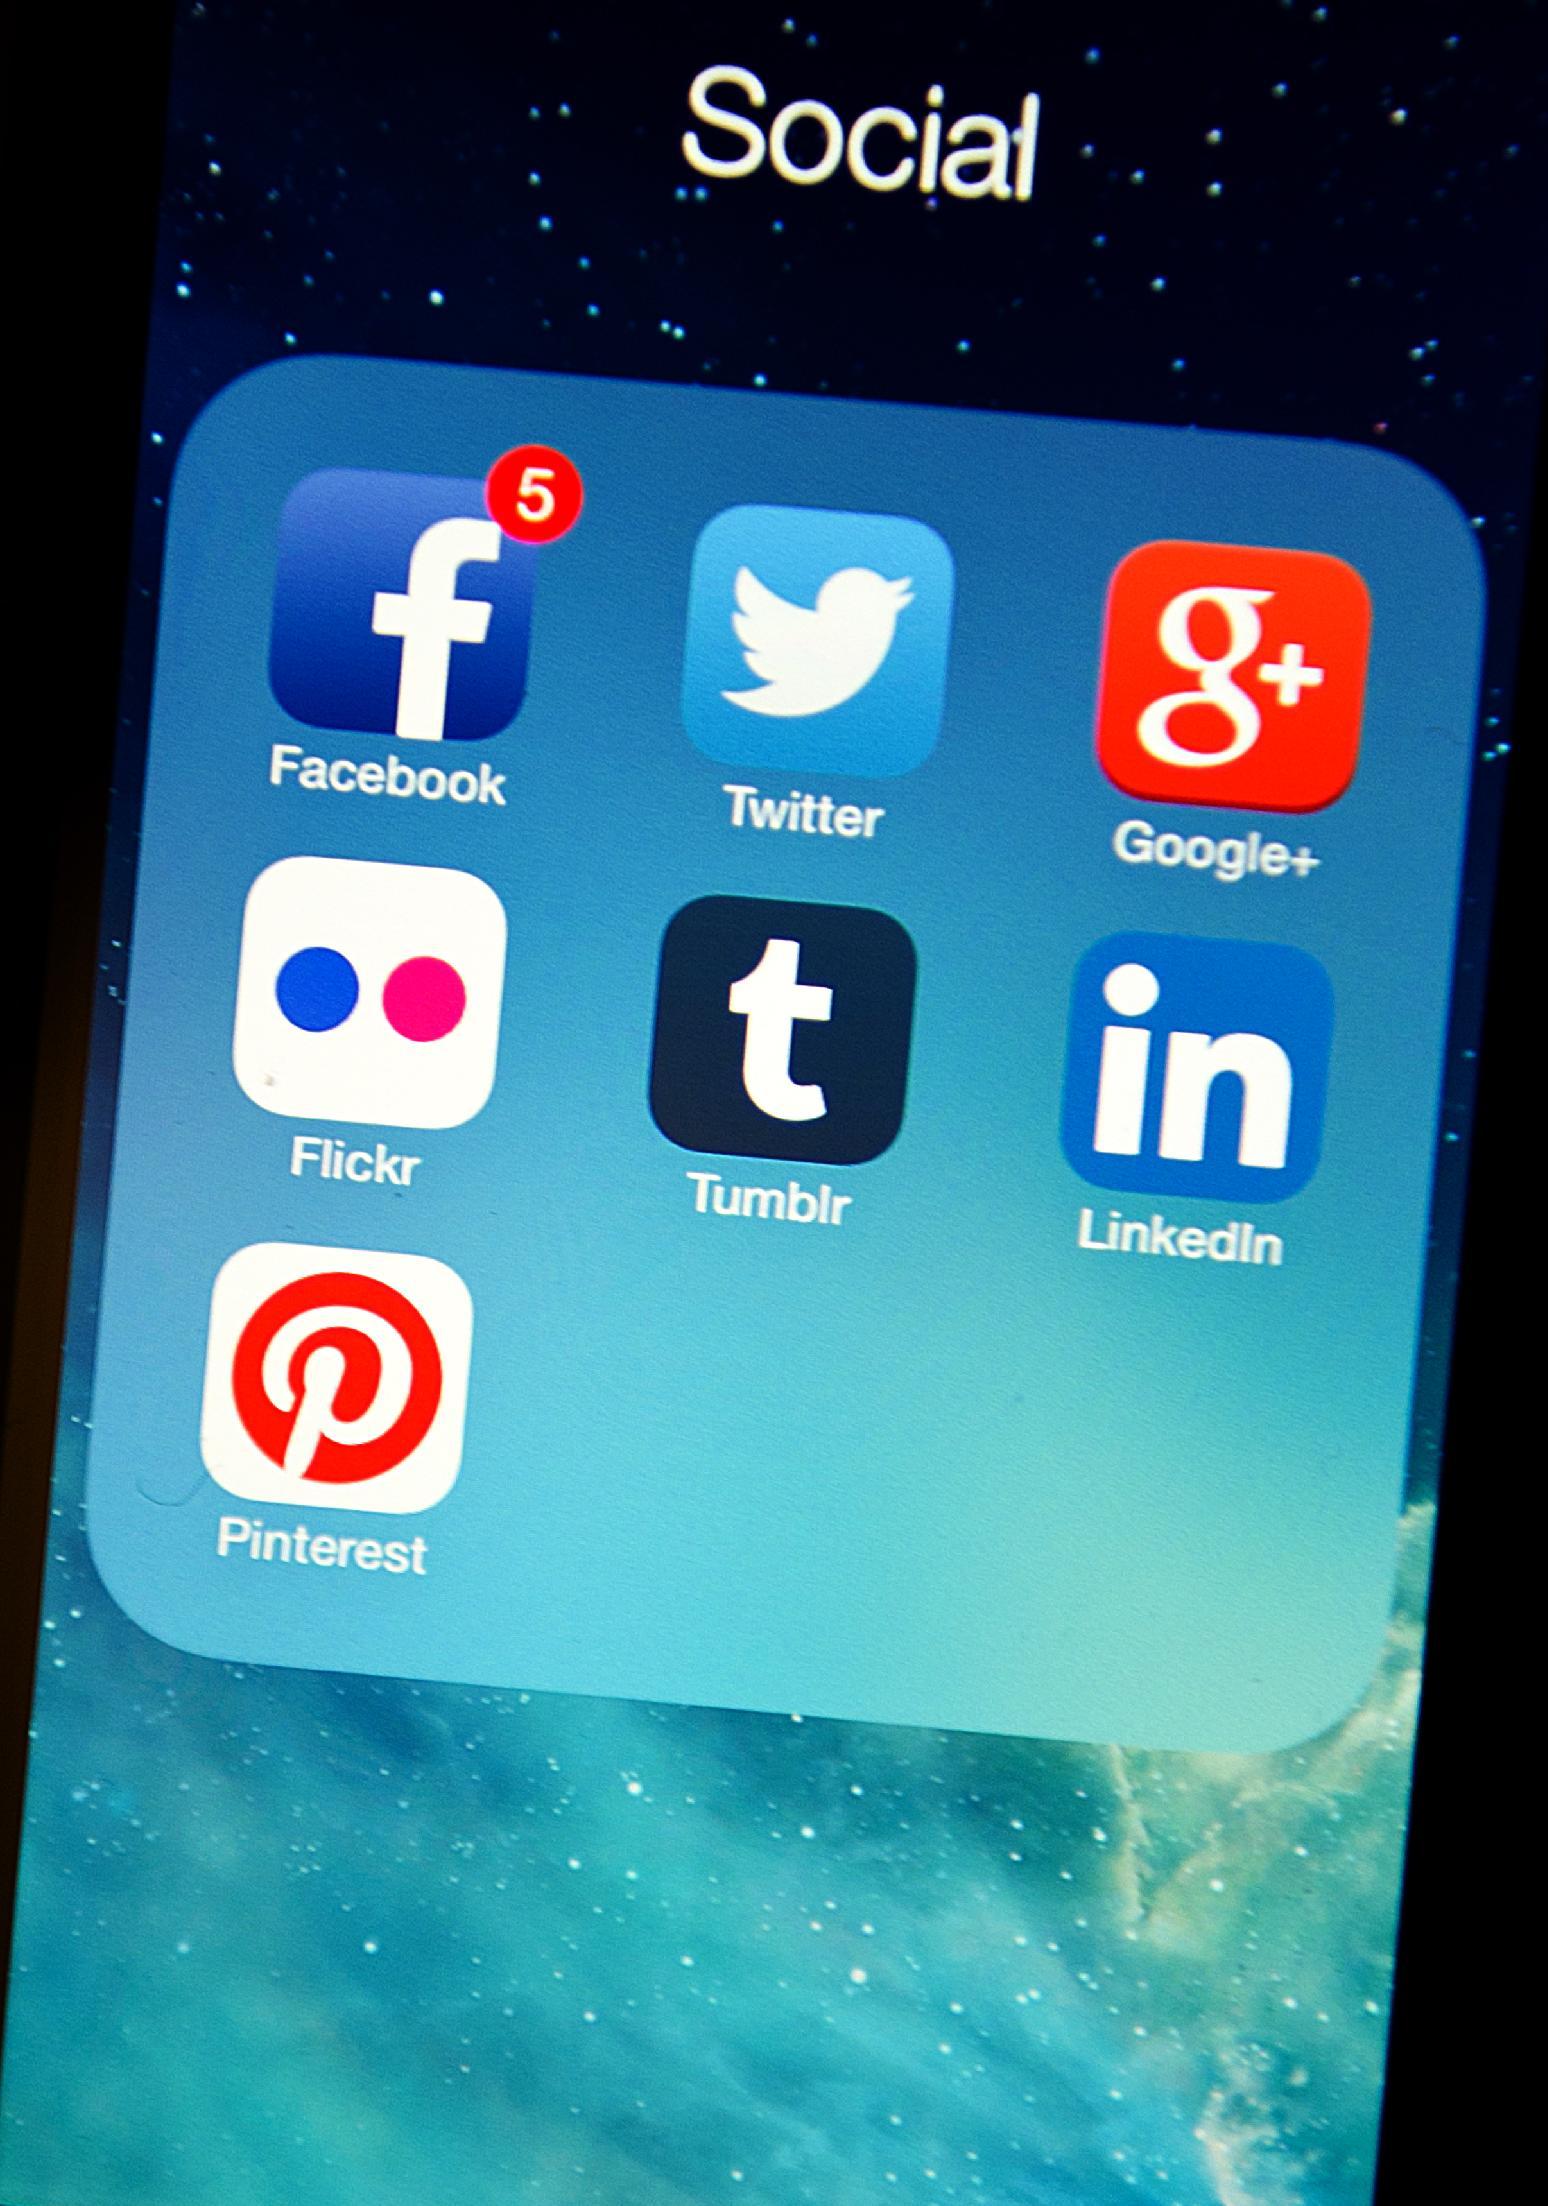 Social media's Hootsuite joins $1bn club